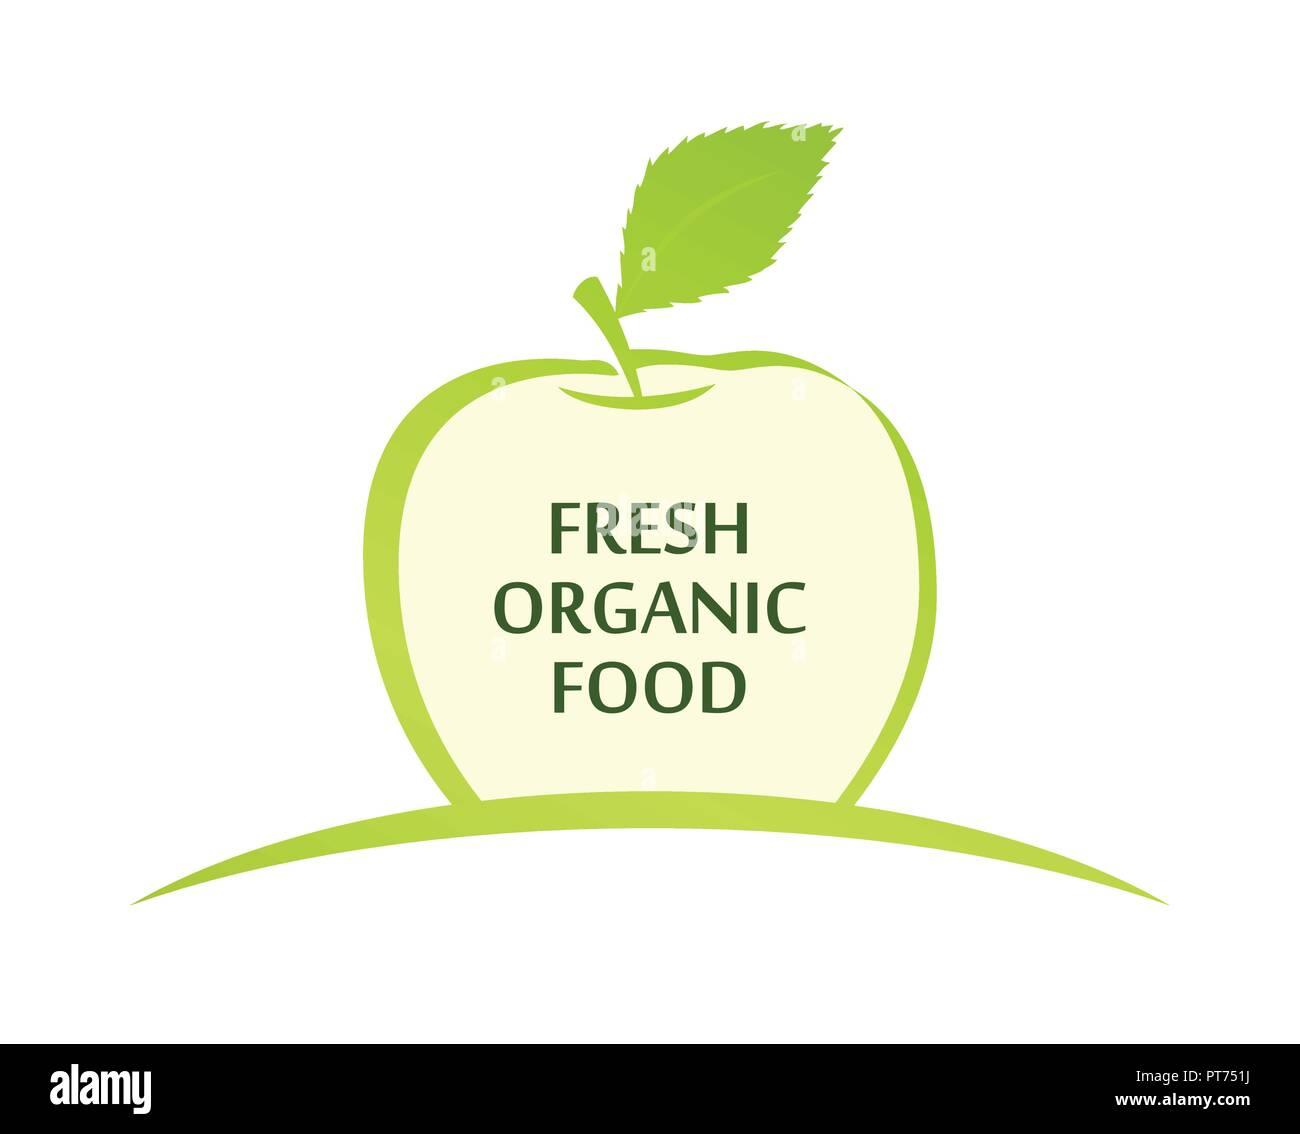 Emblem of Fresh Organic Food - Stock Vector